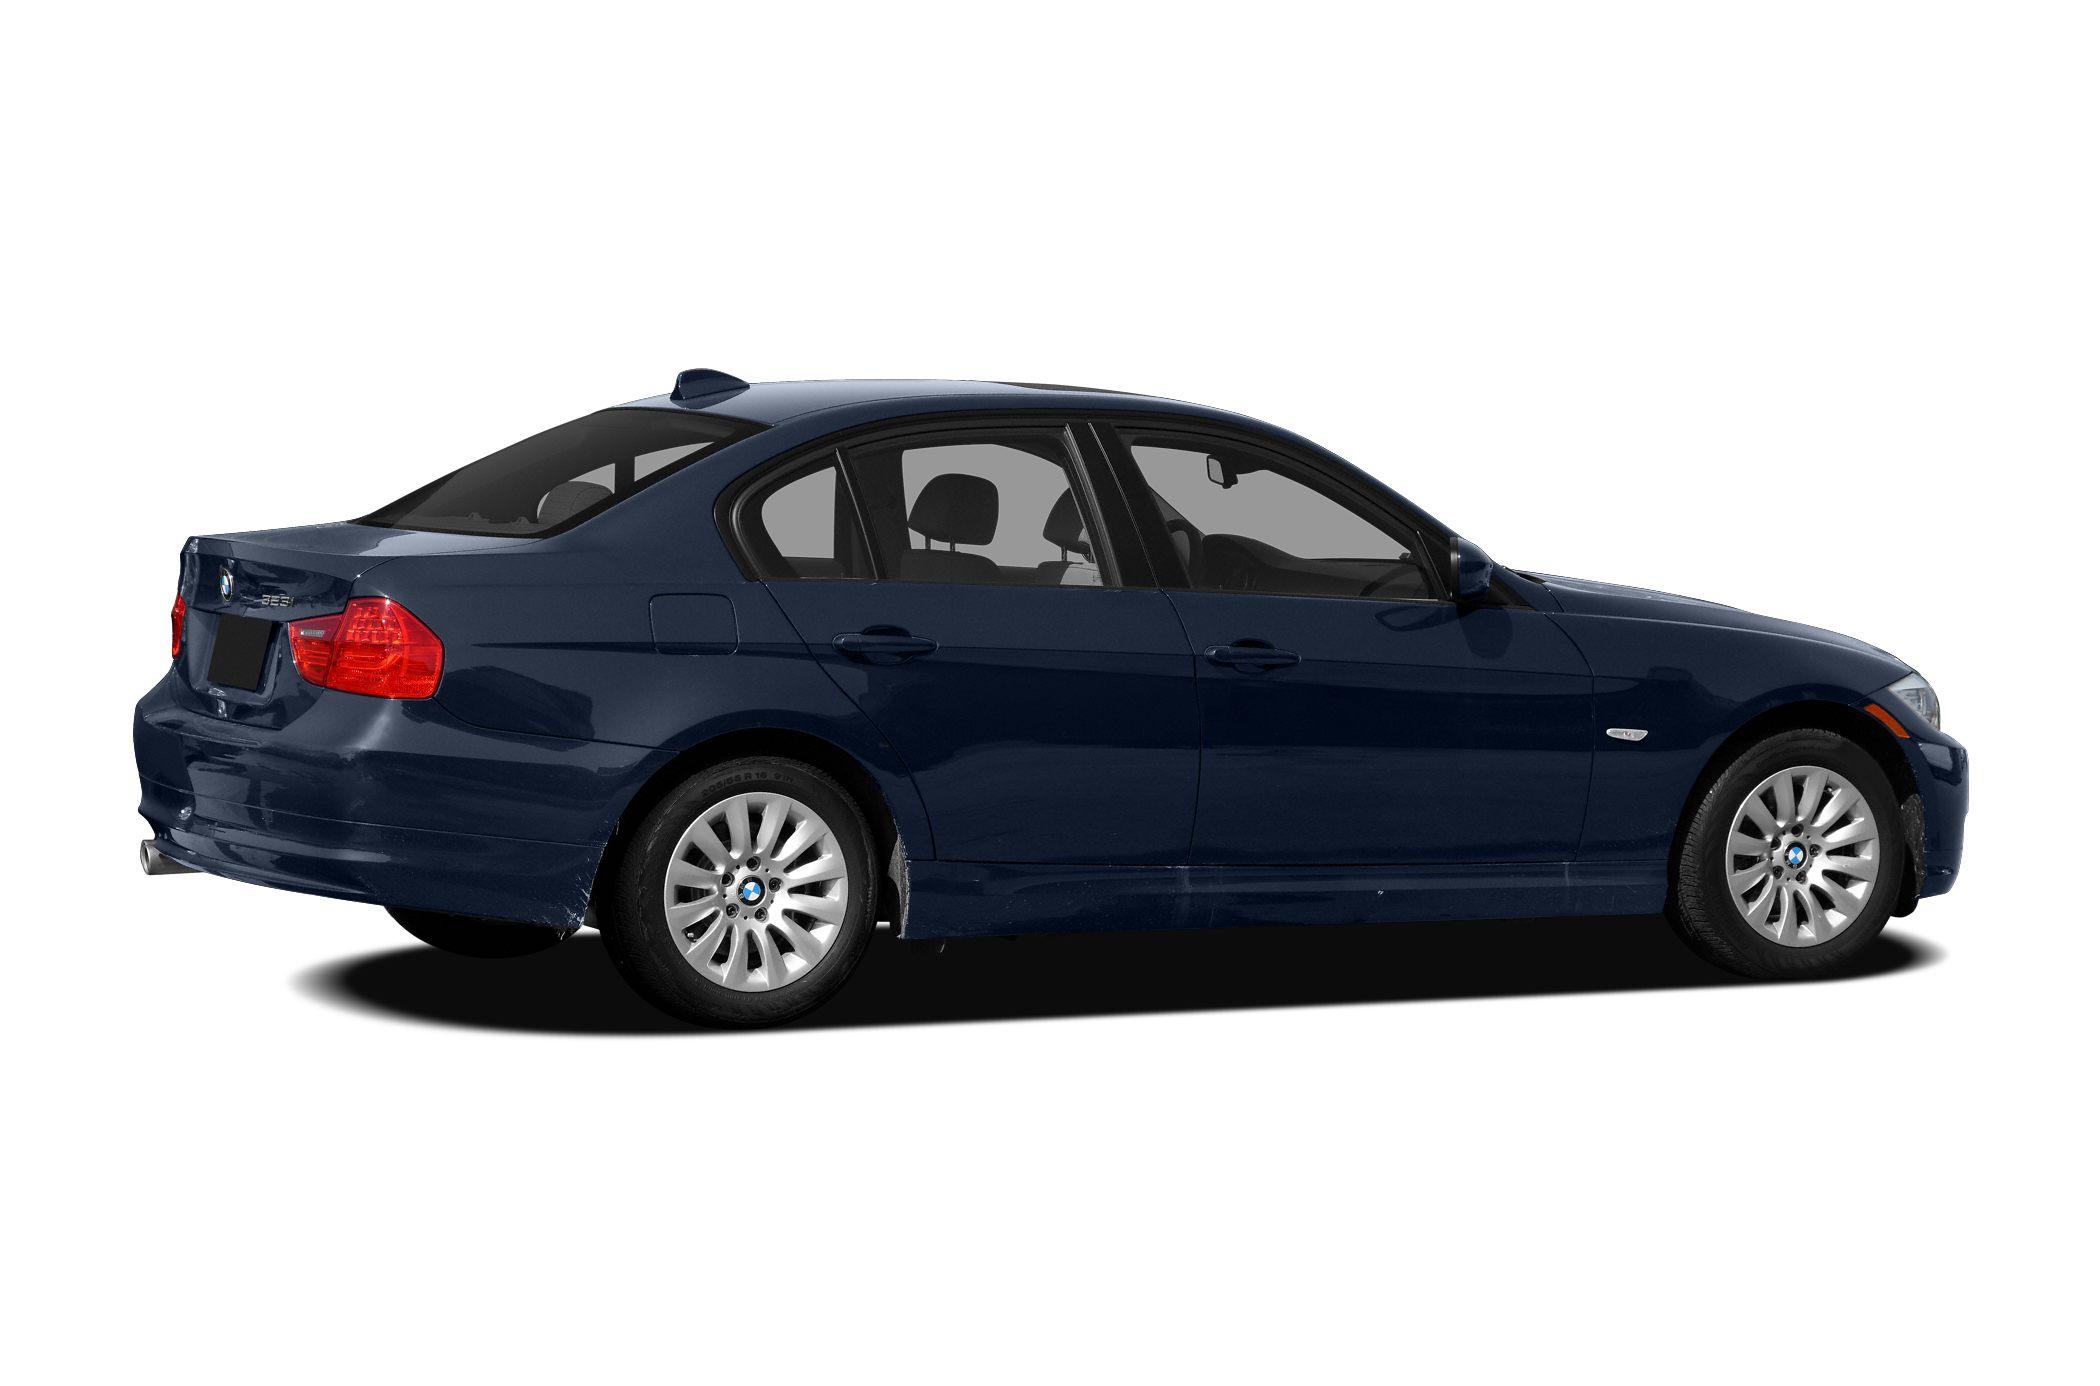 2011 BMW 3 Series 328i xDrive AWD Black 2011 BMW 3 Series 328i xDrive AWD 30L 6-Cylinder DOHC Re